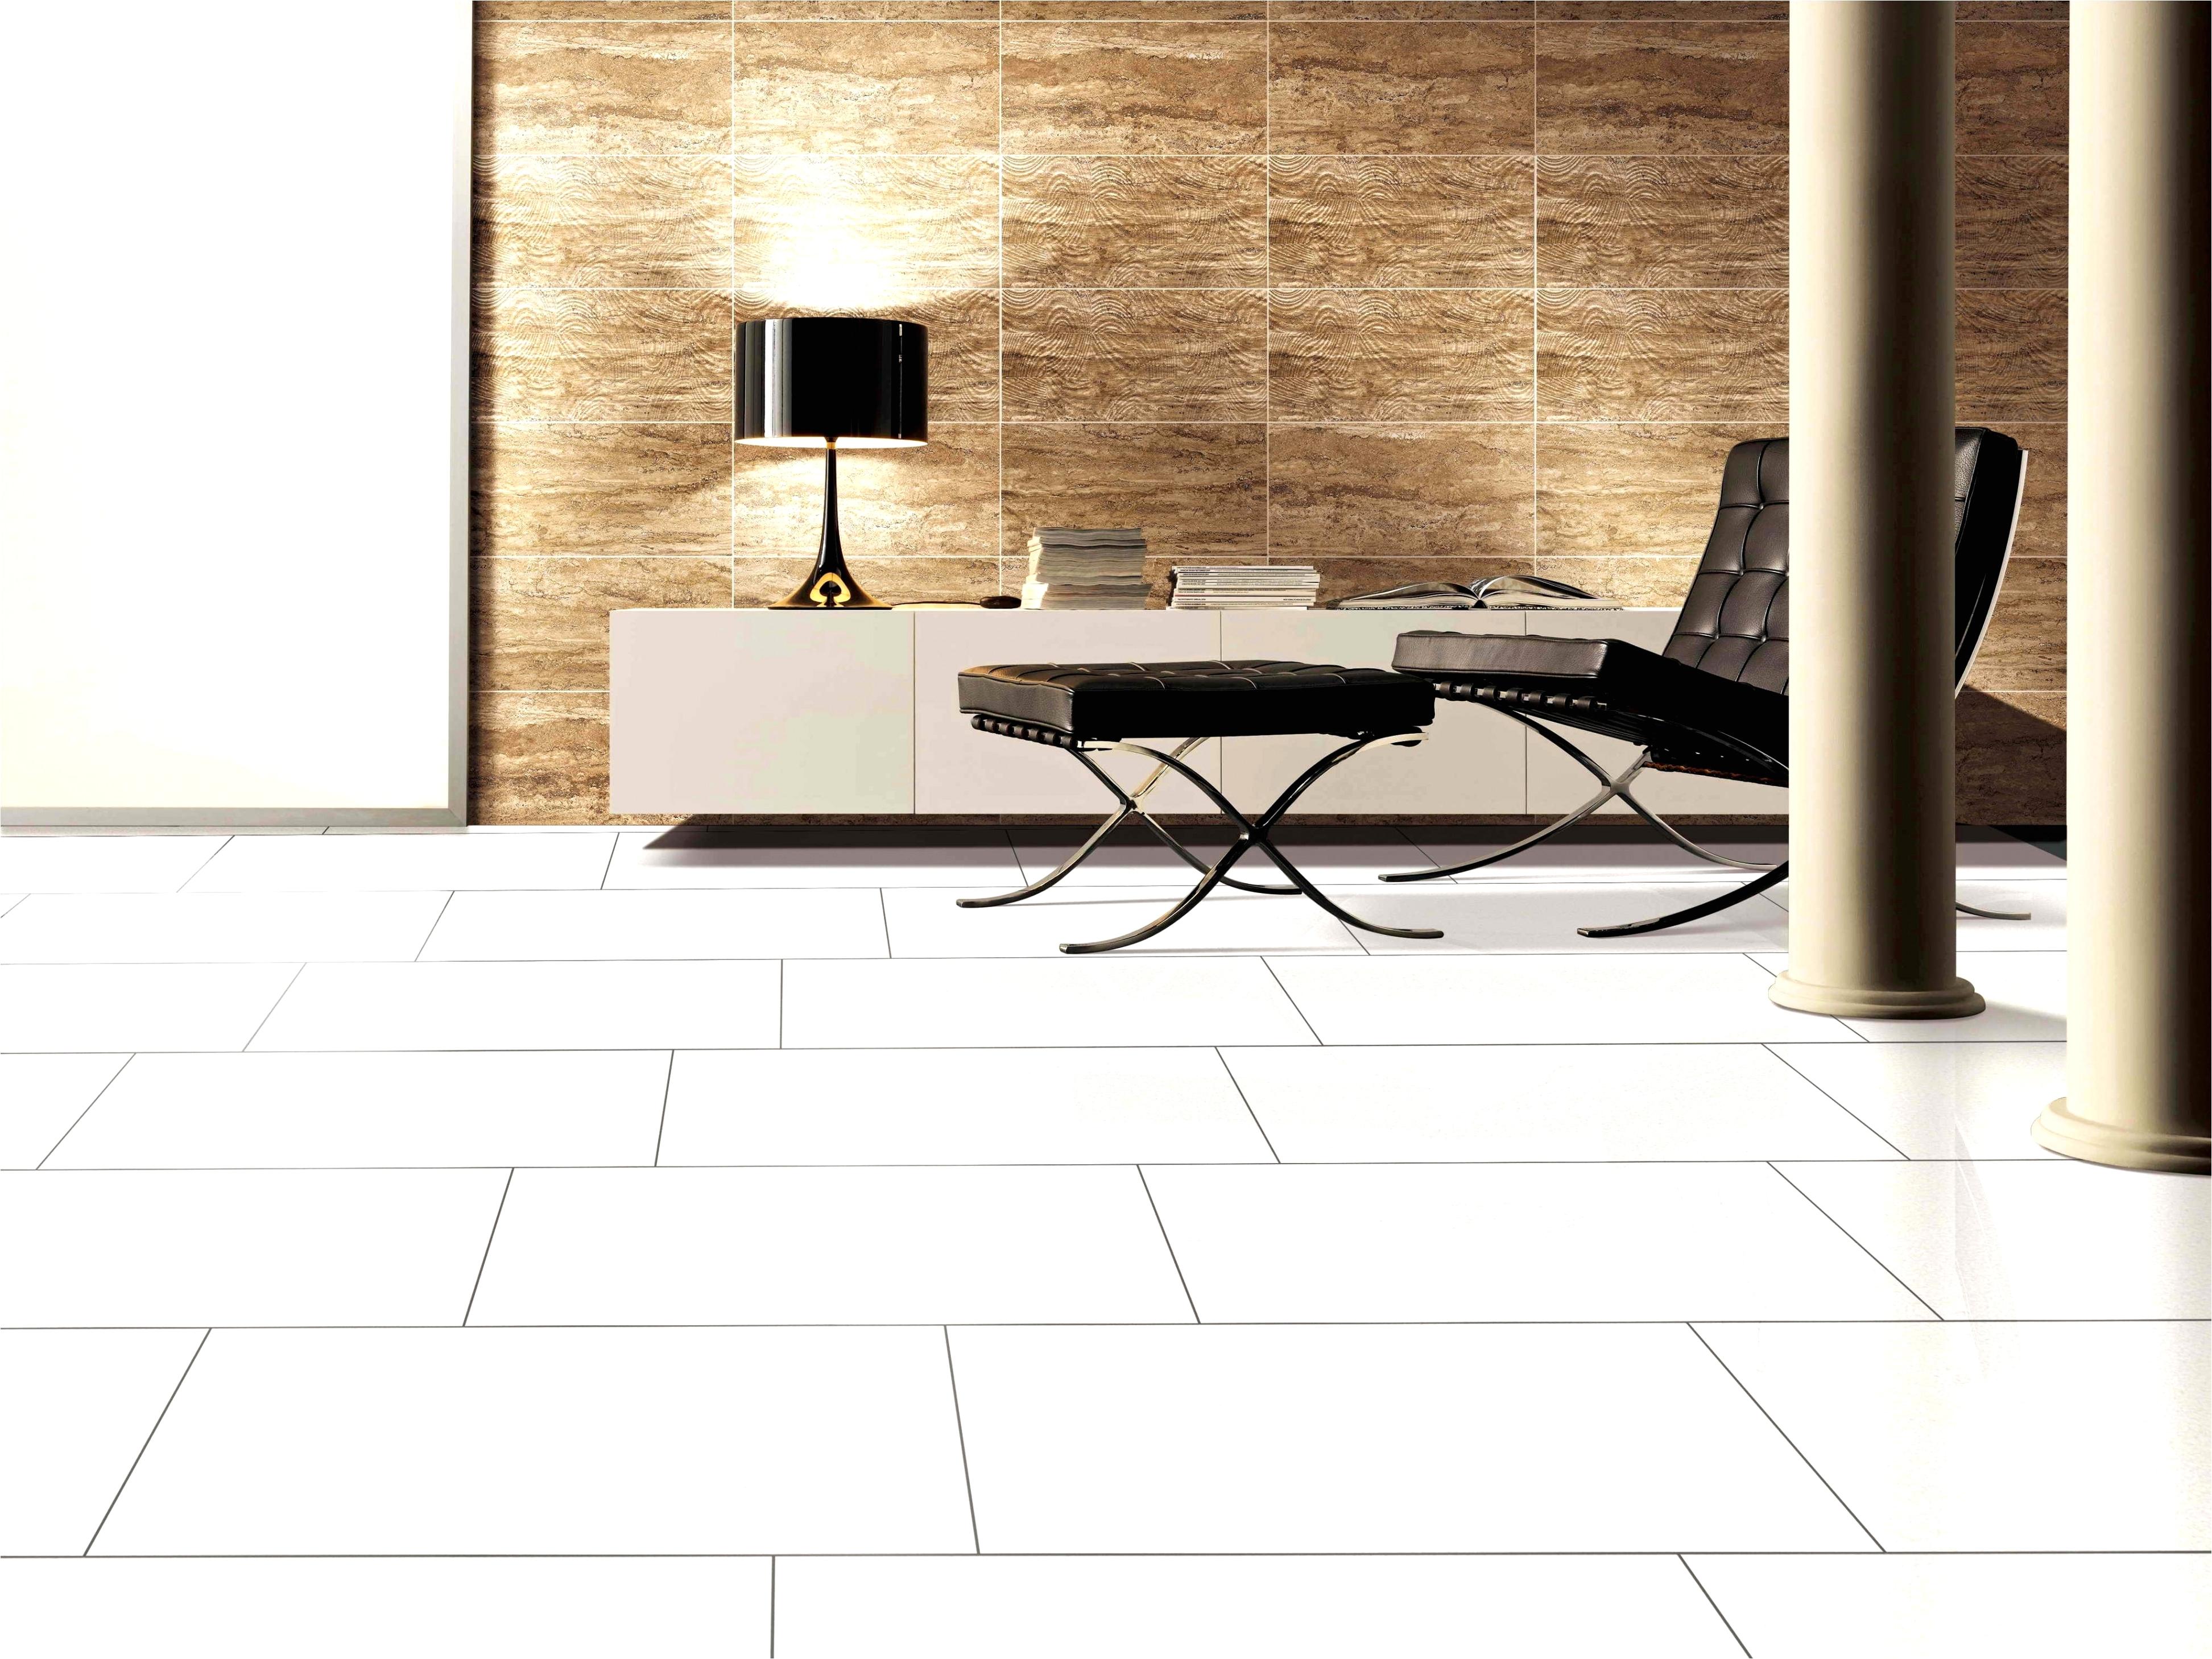 Premier Decor Tile Installation 50 Unique How to Install Mosaic Tile Floor Images 50 Photos Home